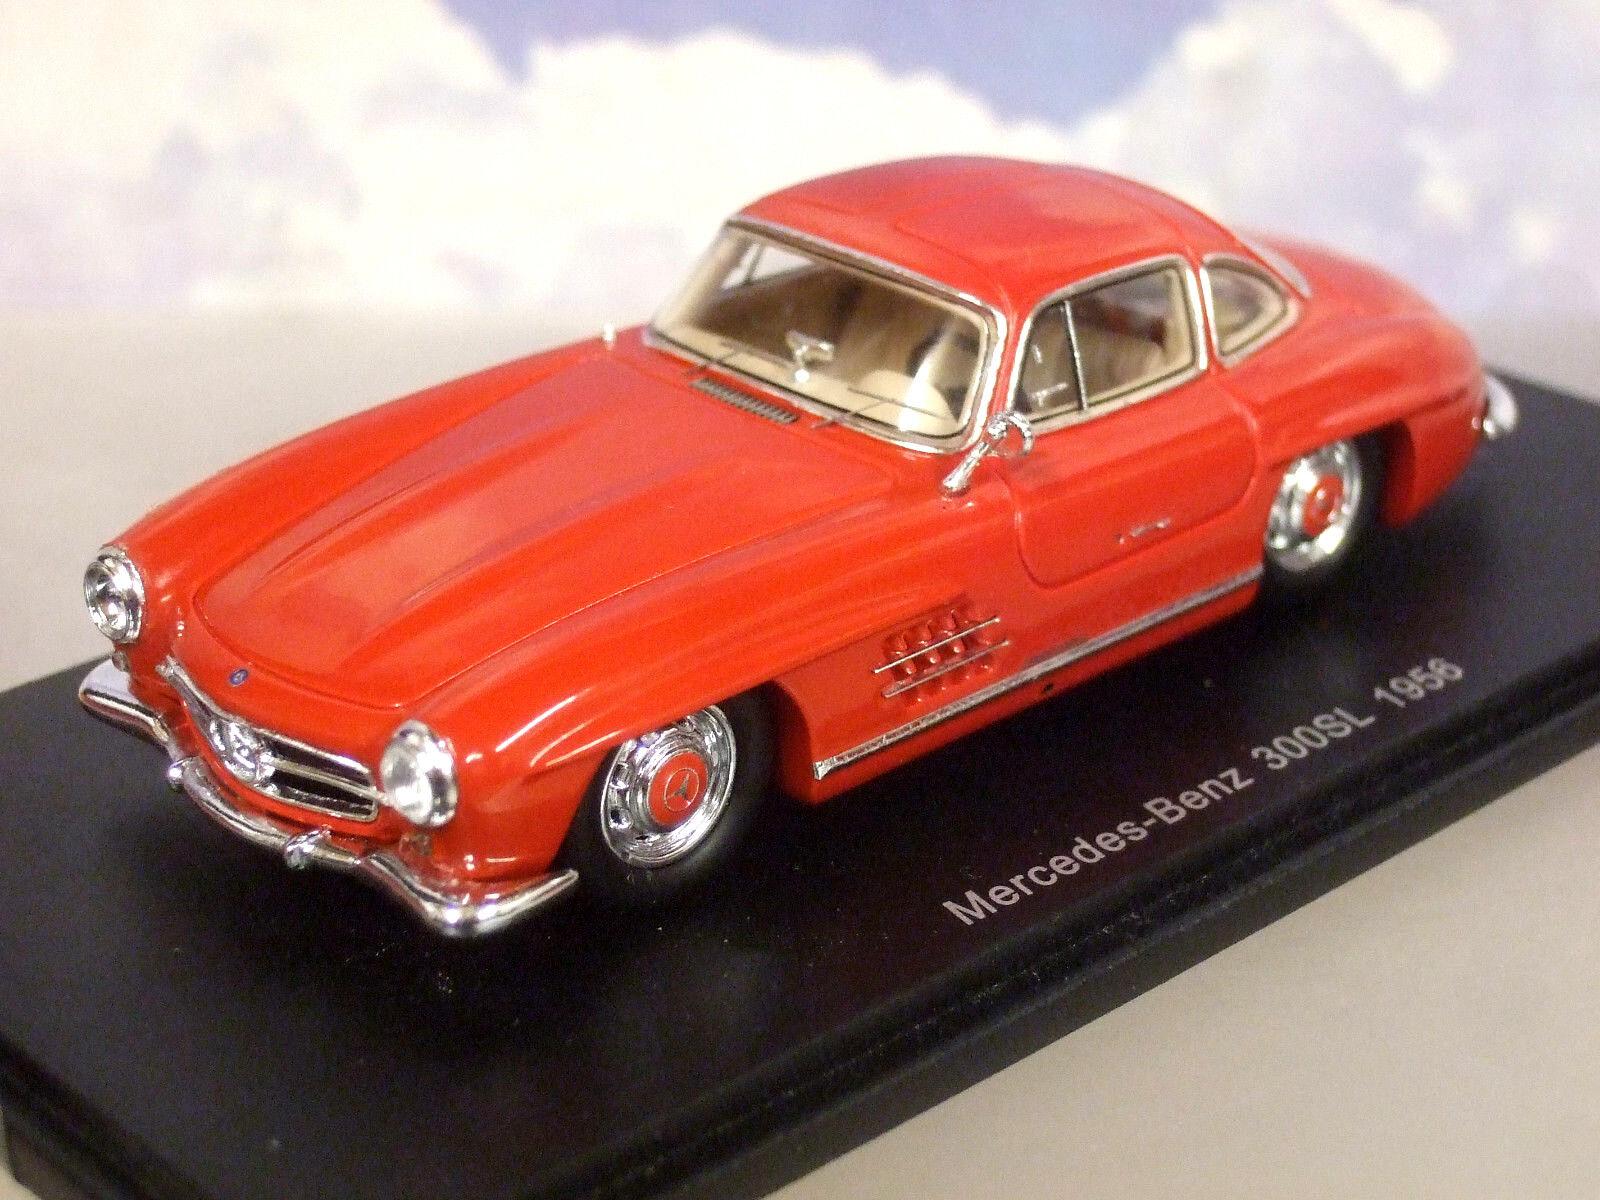 Eccellente Spark 1/43 Resina 1956 Mercedes-Benz 300sl Gullwing in Rosso S4959